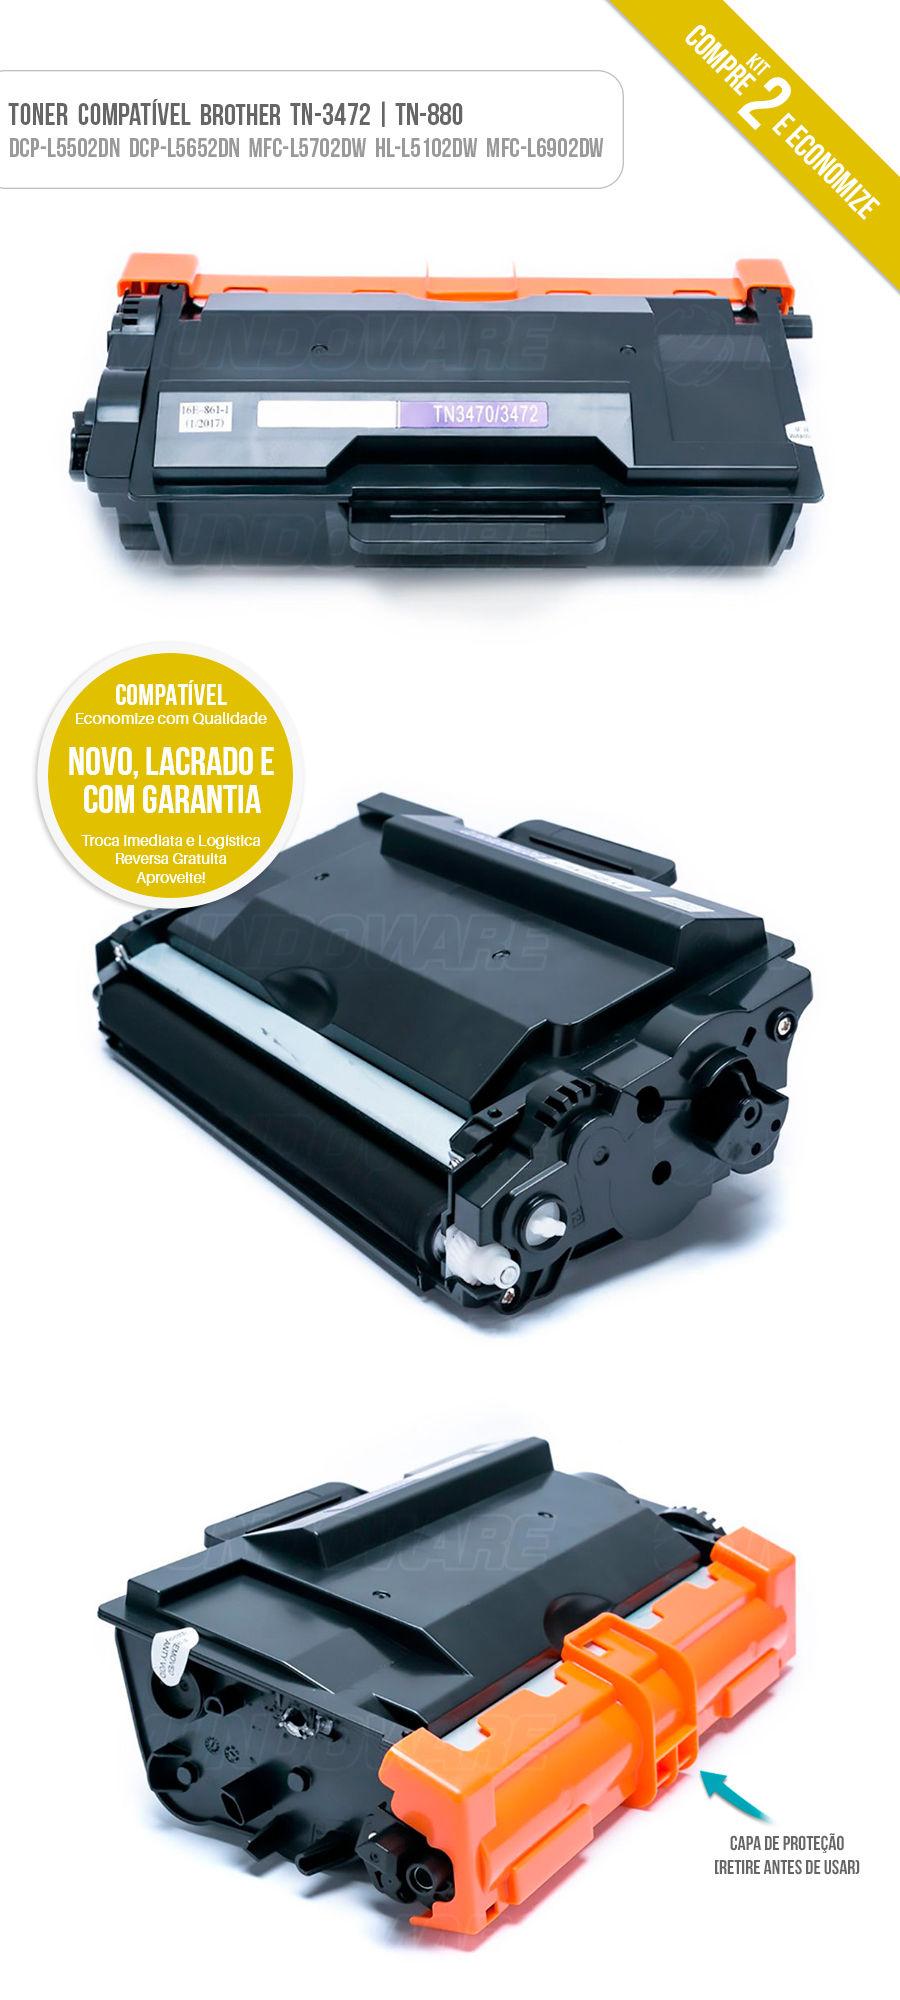 Kit 2x Tonner Compativel Brother para HL-L5102DW DCP-L5502DN MFC-L6902DW MFC-L5702DW DCP-L5652DN L5202DW L6202DW L6402DW L5602DN L5802DW L5902DW L6702DW2